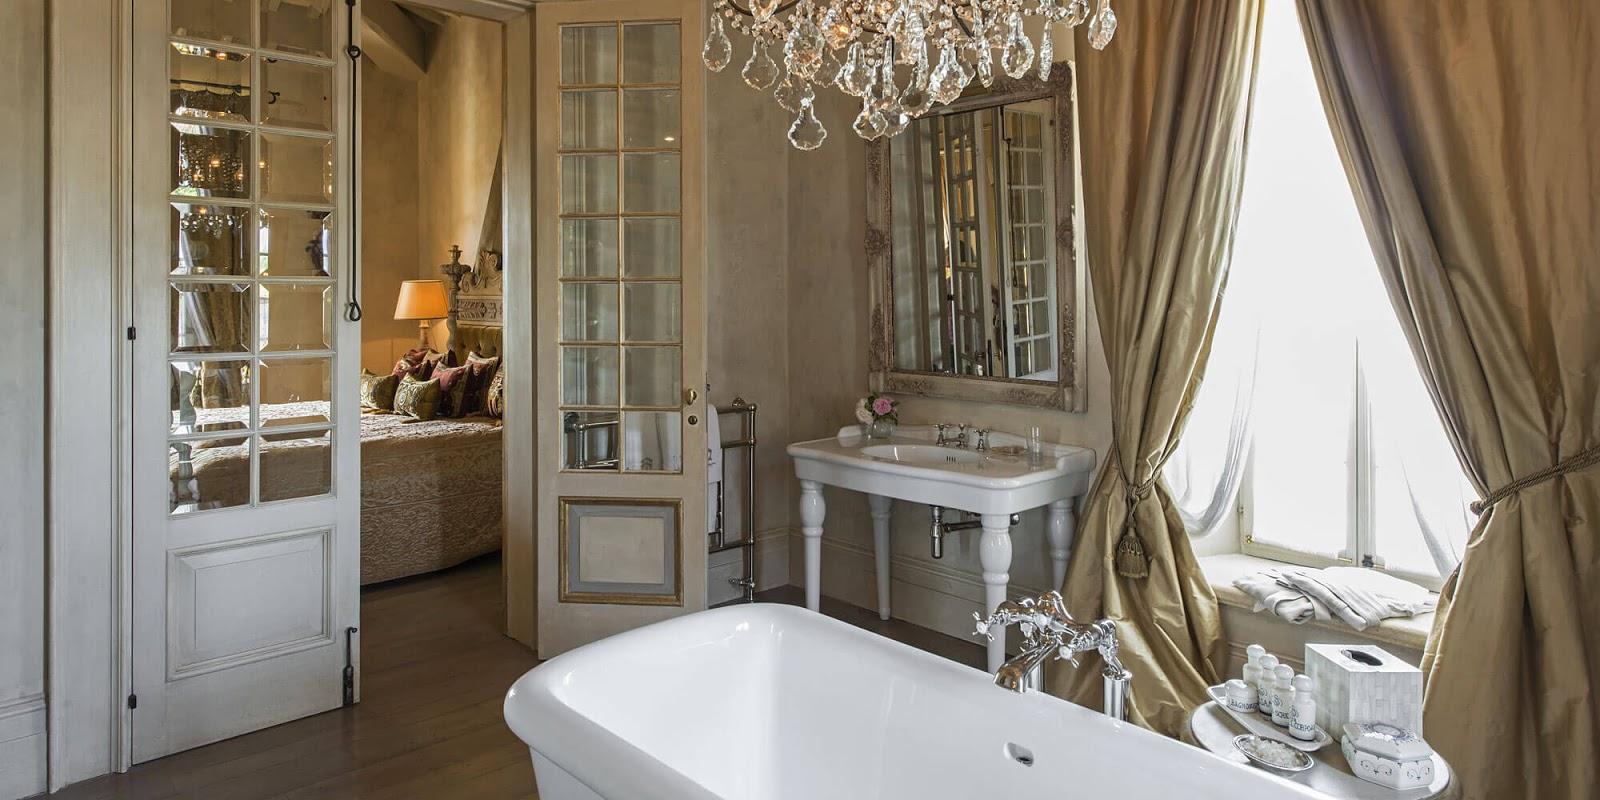 Breathtaking image of the Italian villa Borgo Santo Pietro - found on Hello Lovely Studio